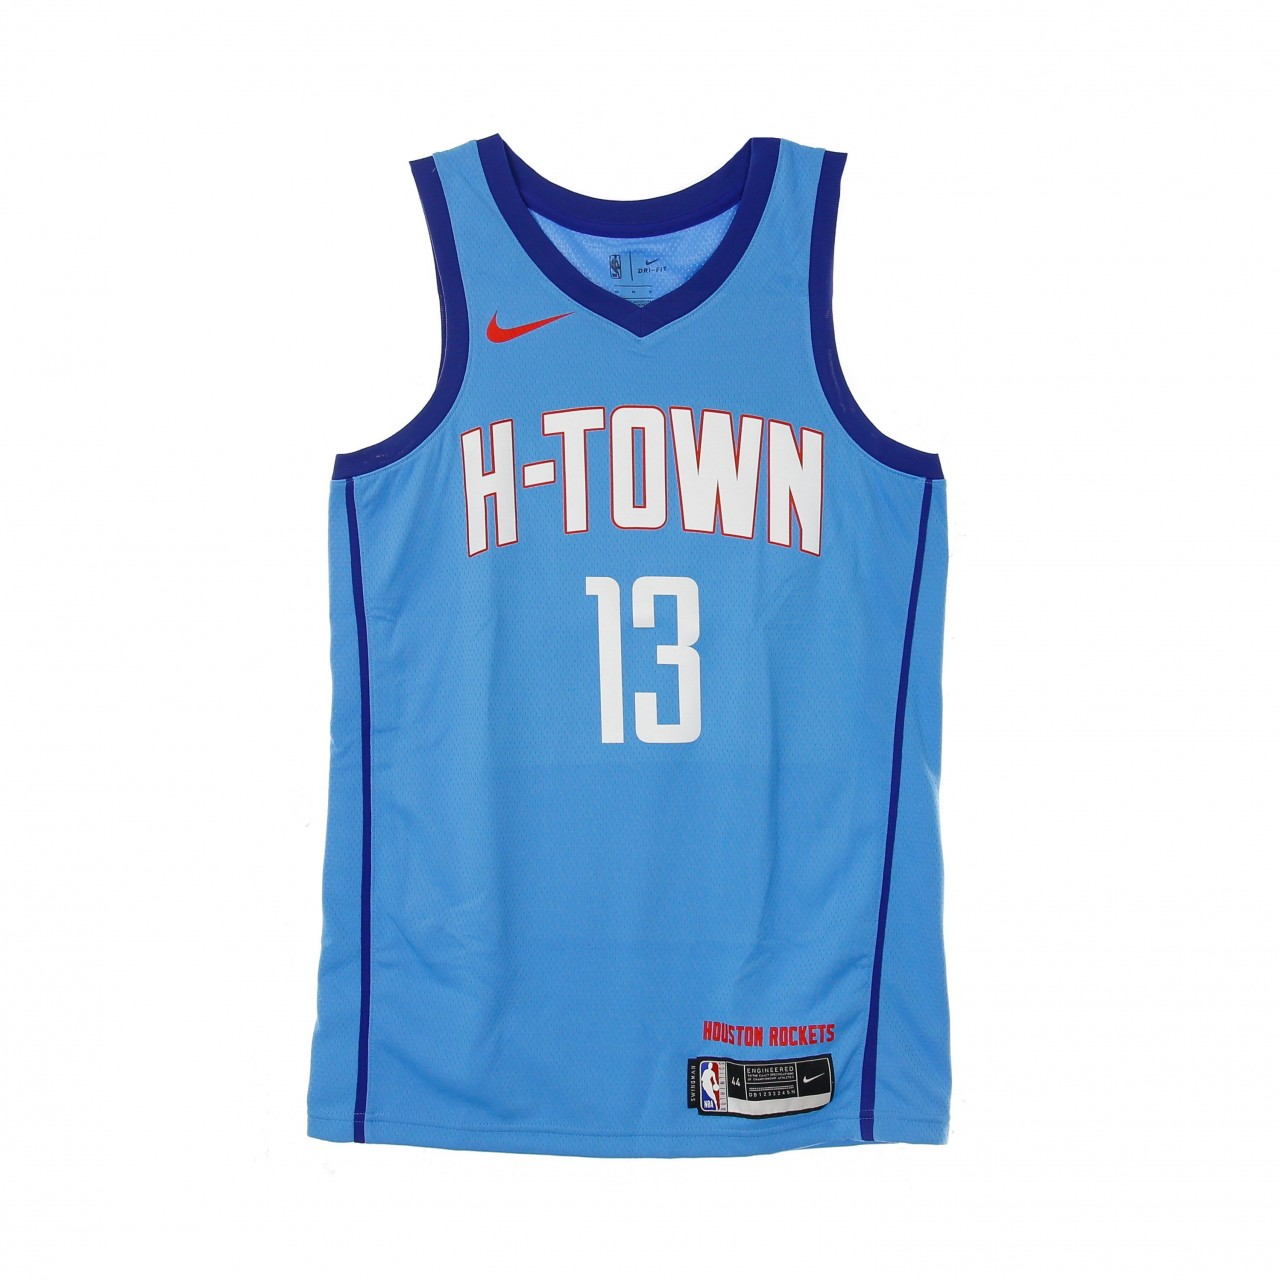 NIKE NBA NBA SWINGMAN JERSEY CITY EDITION 2020 NO 13 JAMES HARDEN HOUROC CN1731-467